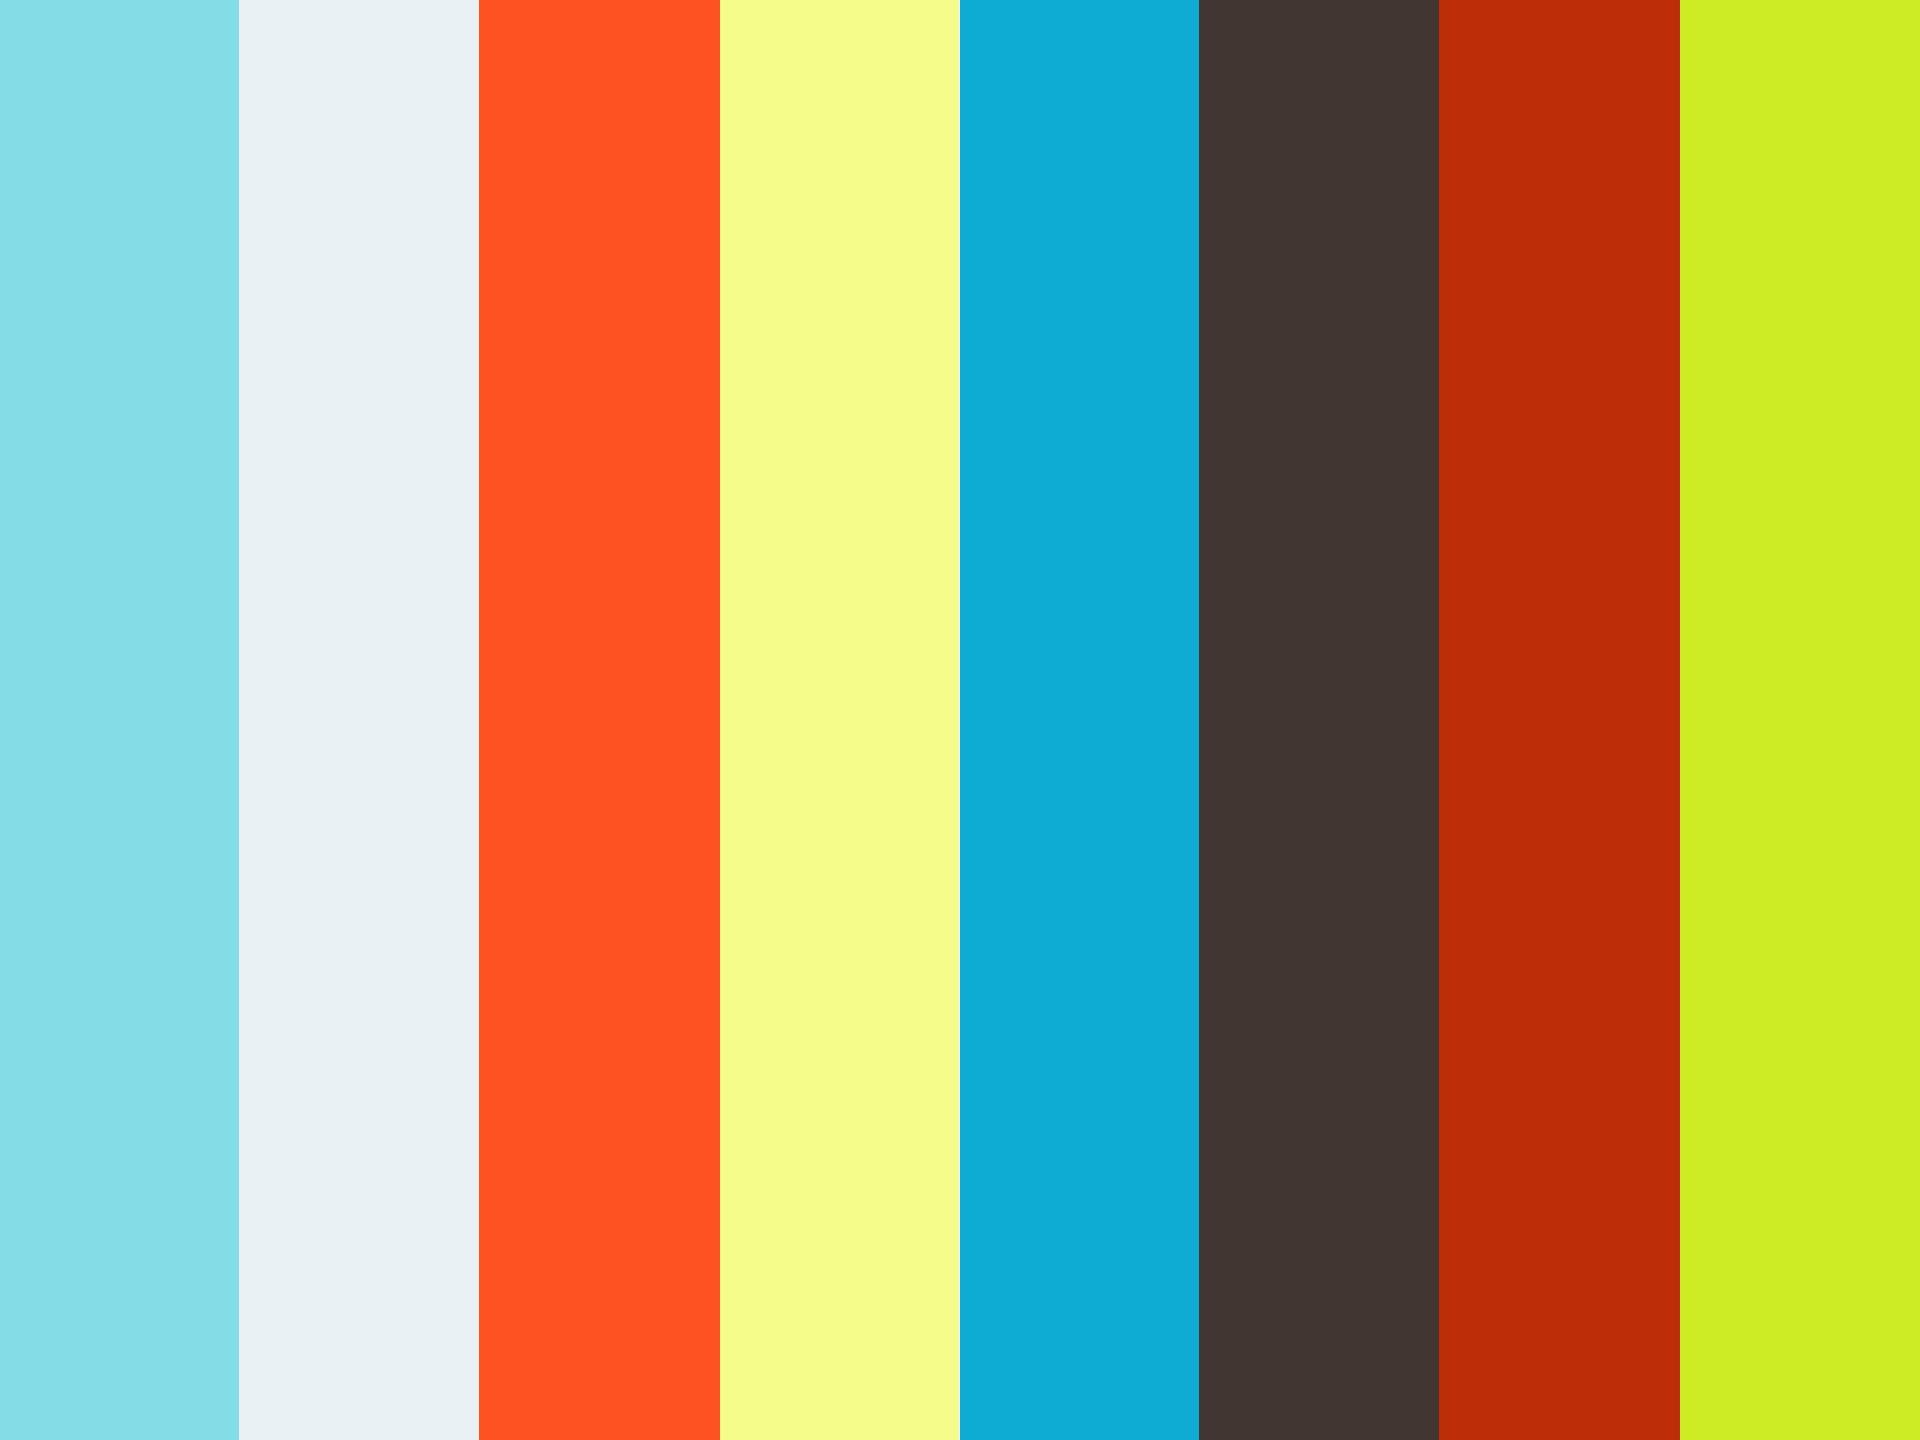 【Nex】八木洋二郎先生 : ダイレクトボンデットレストレーション #3